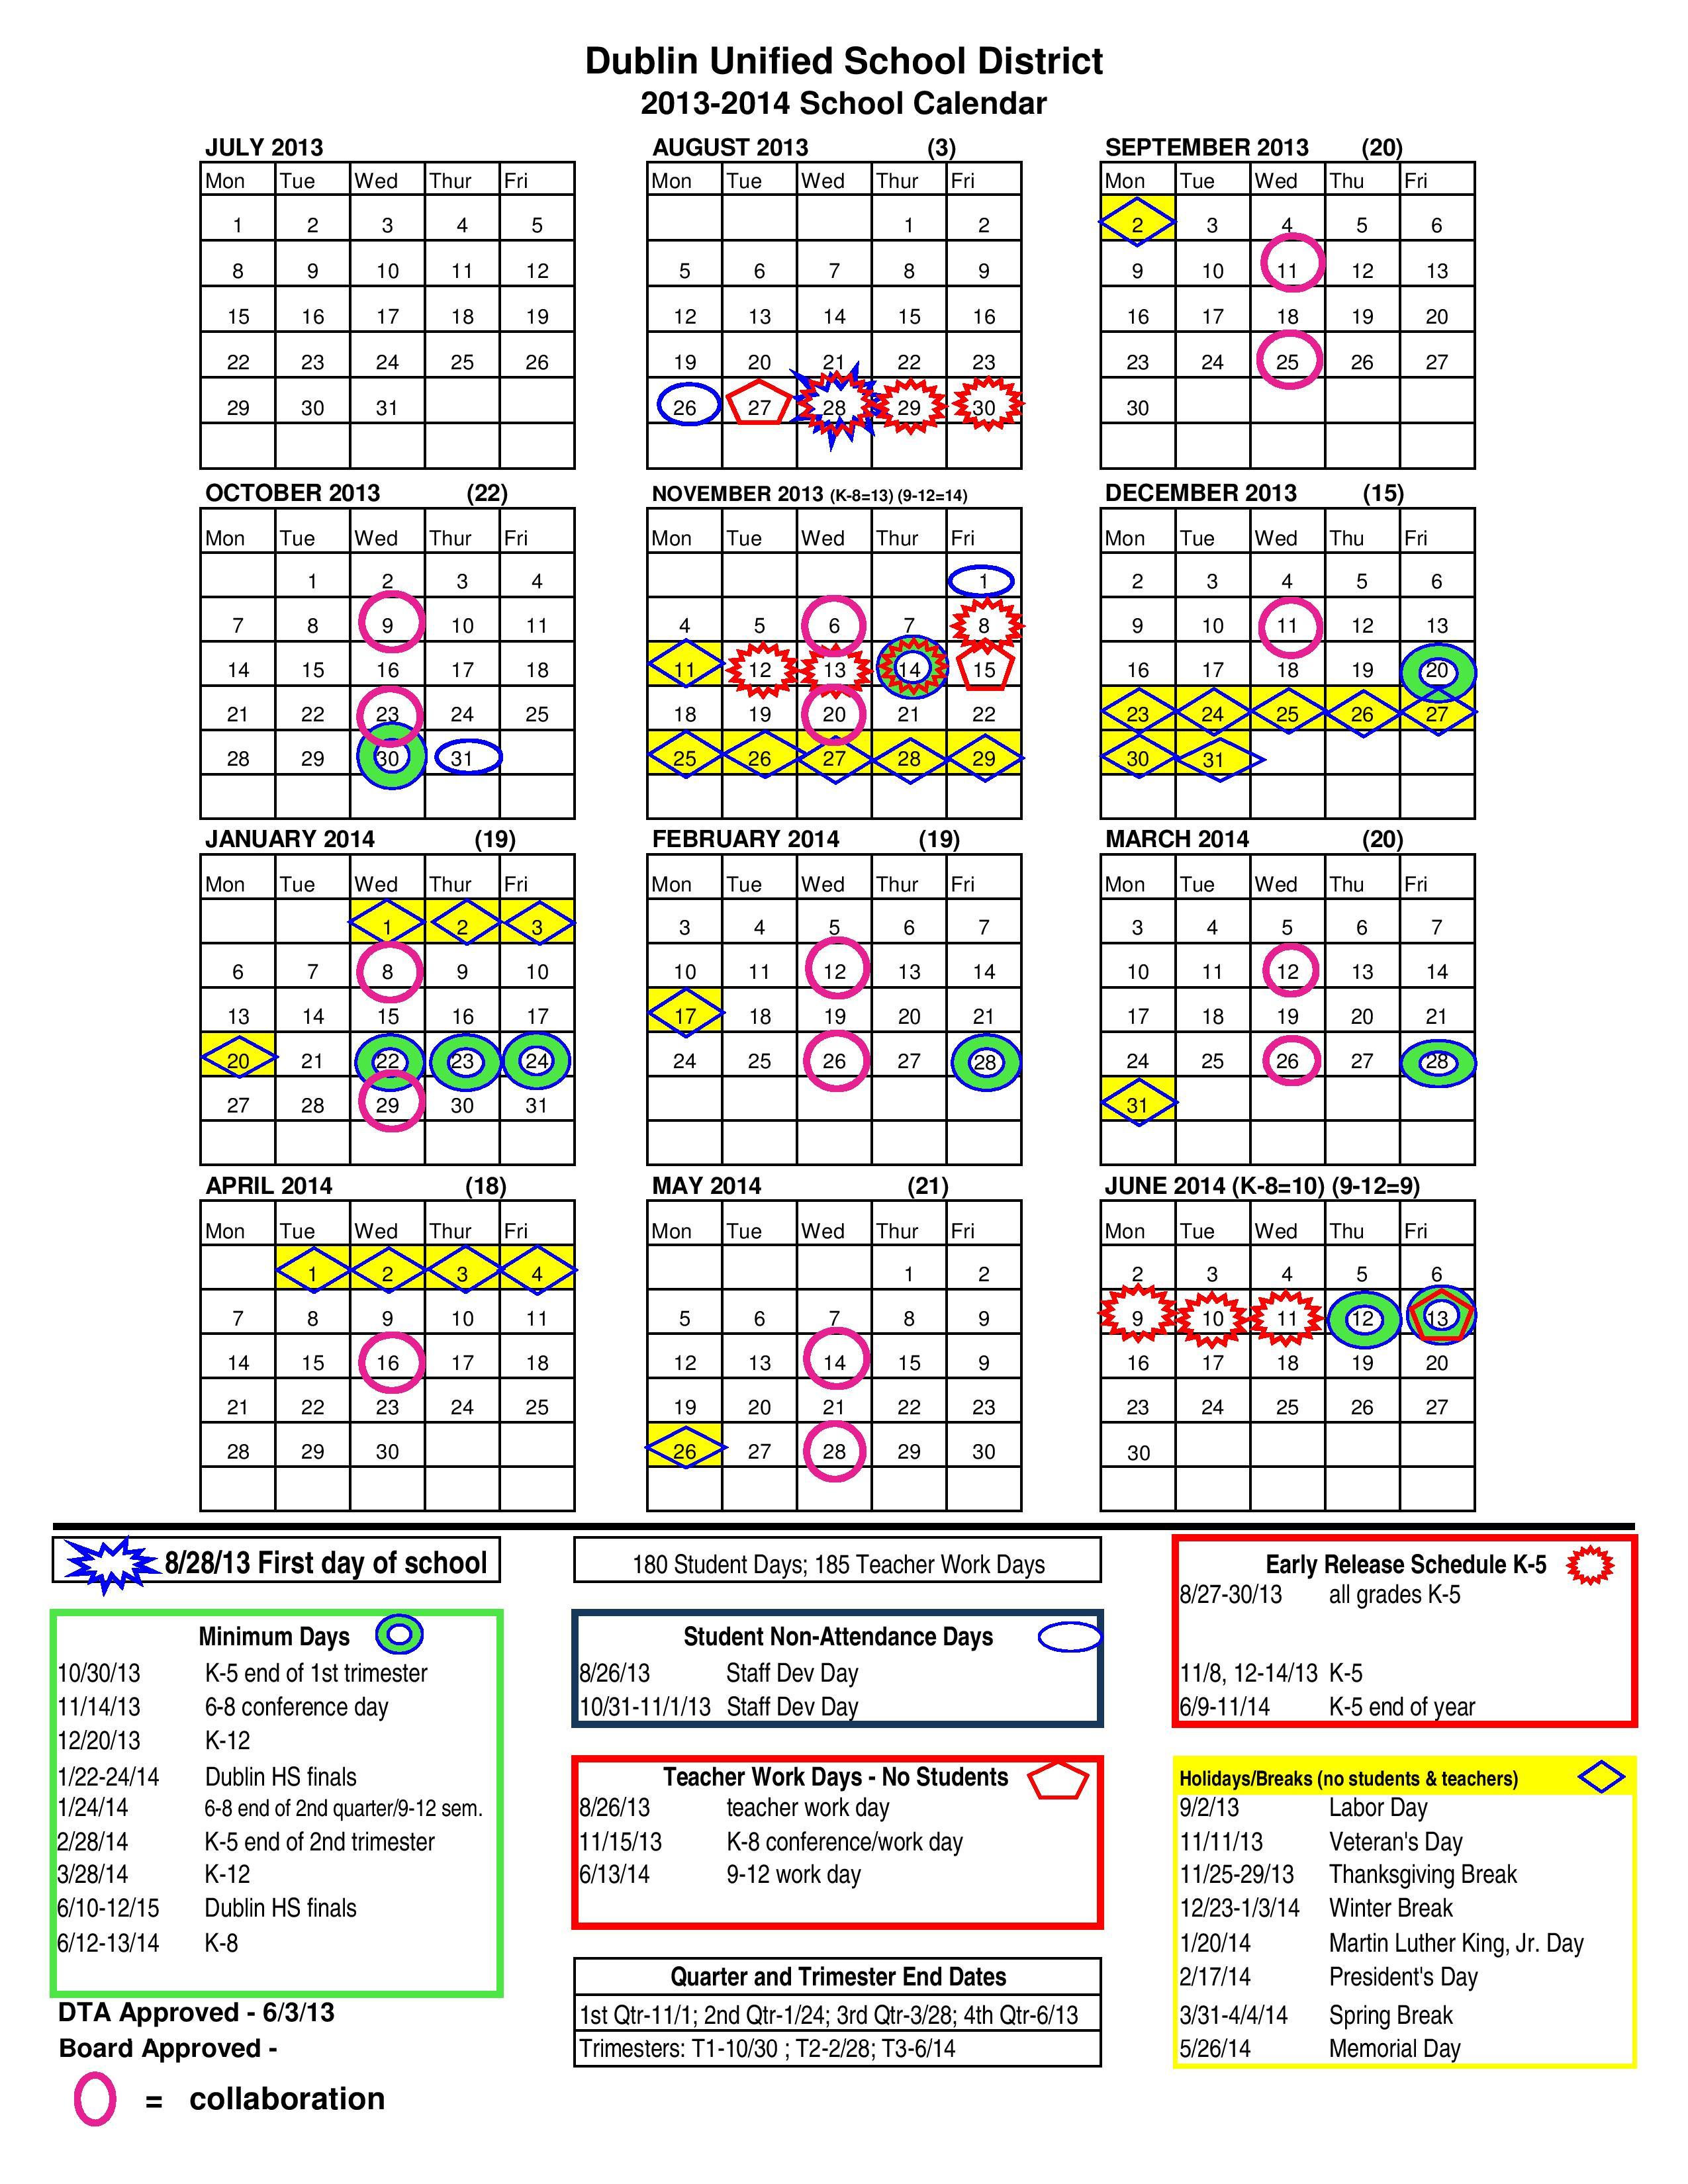 Dublin School Calendars 2013-14 | OneDublin.org